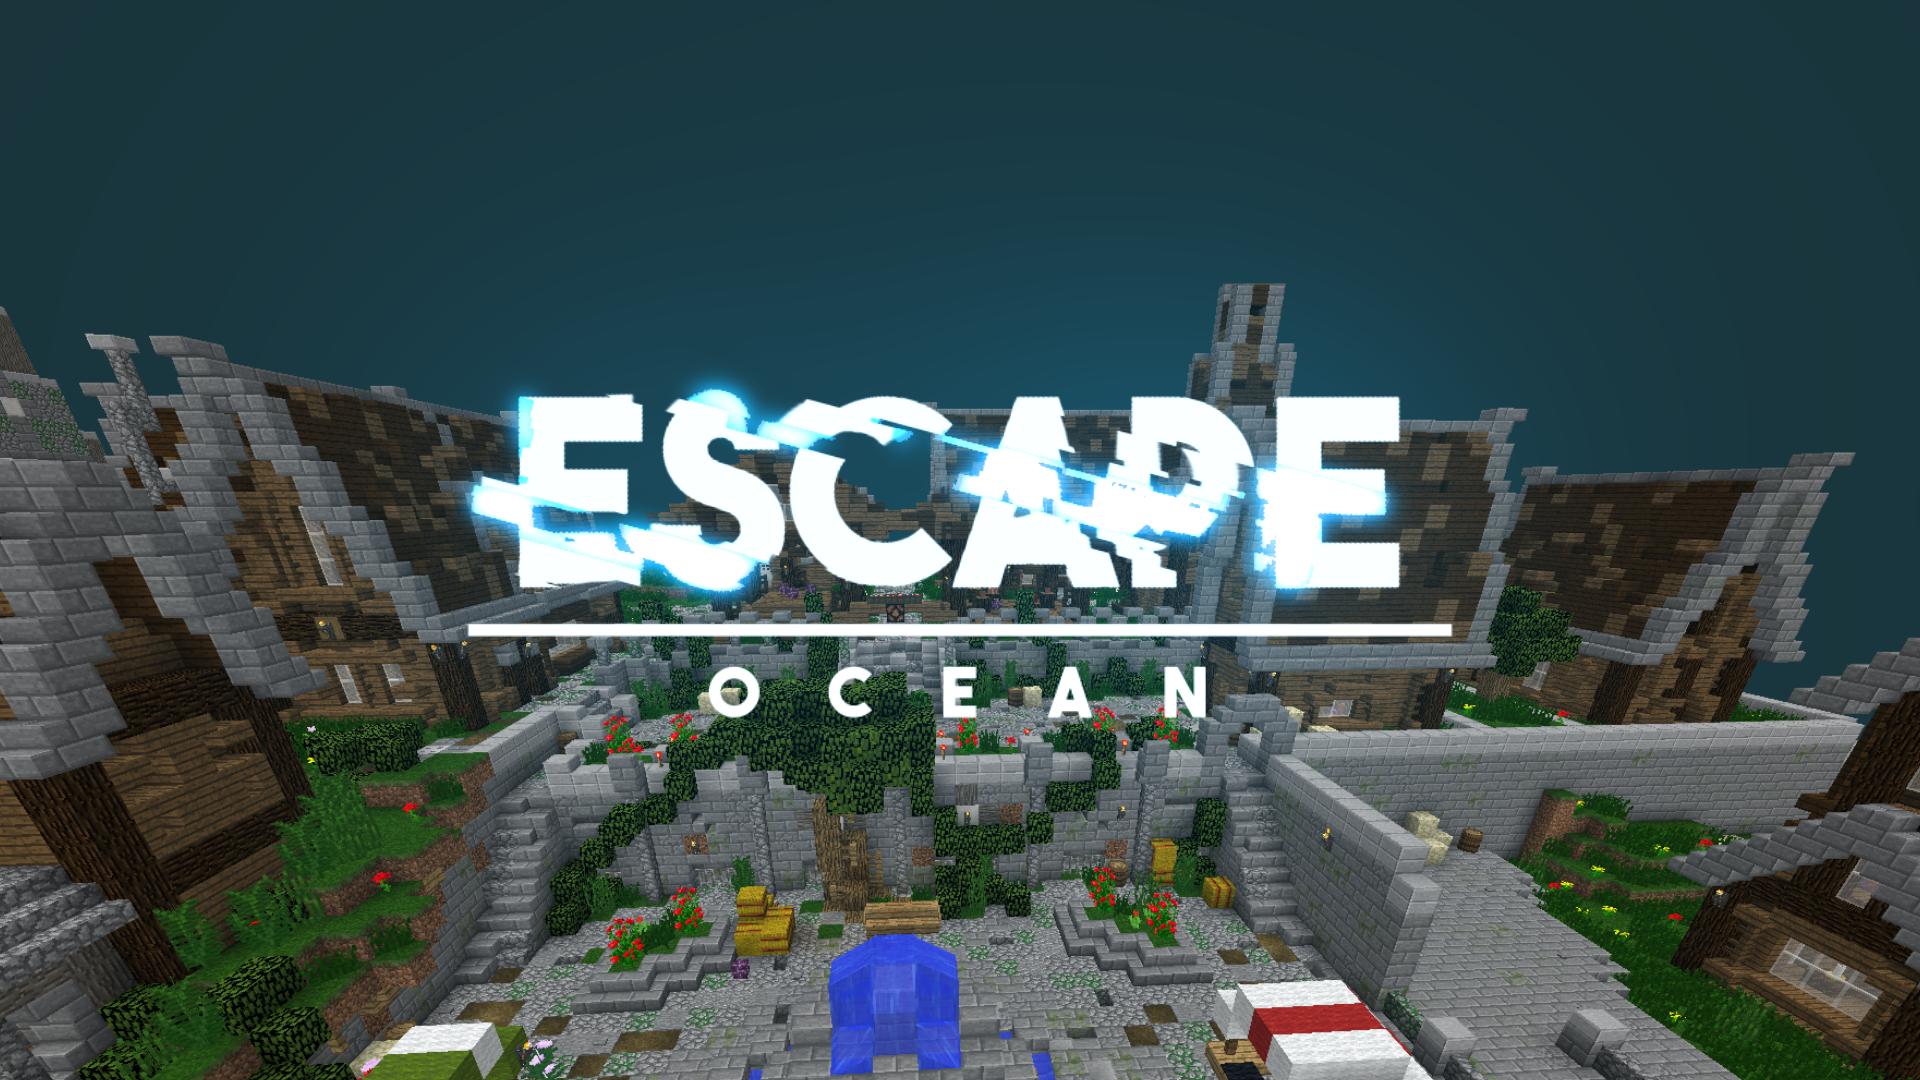 Escape: Ocean